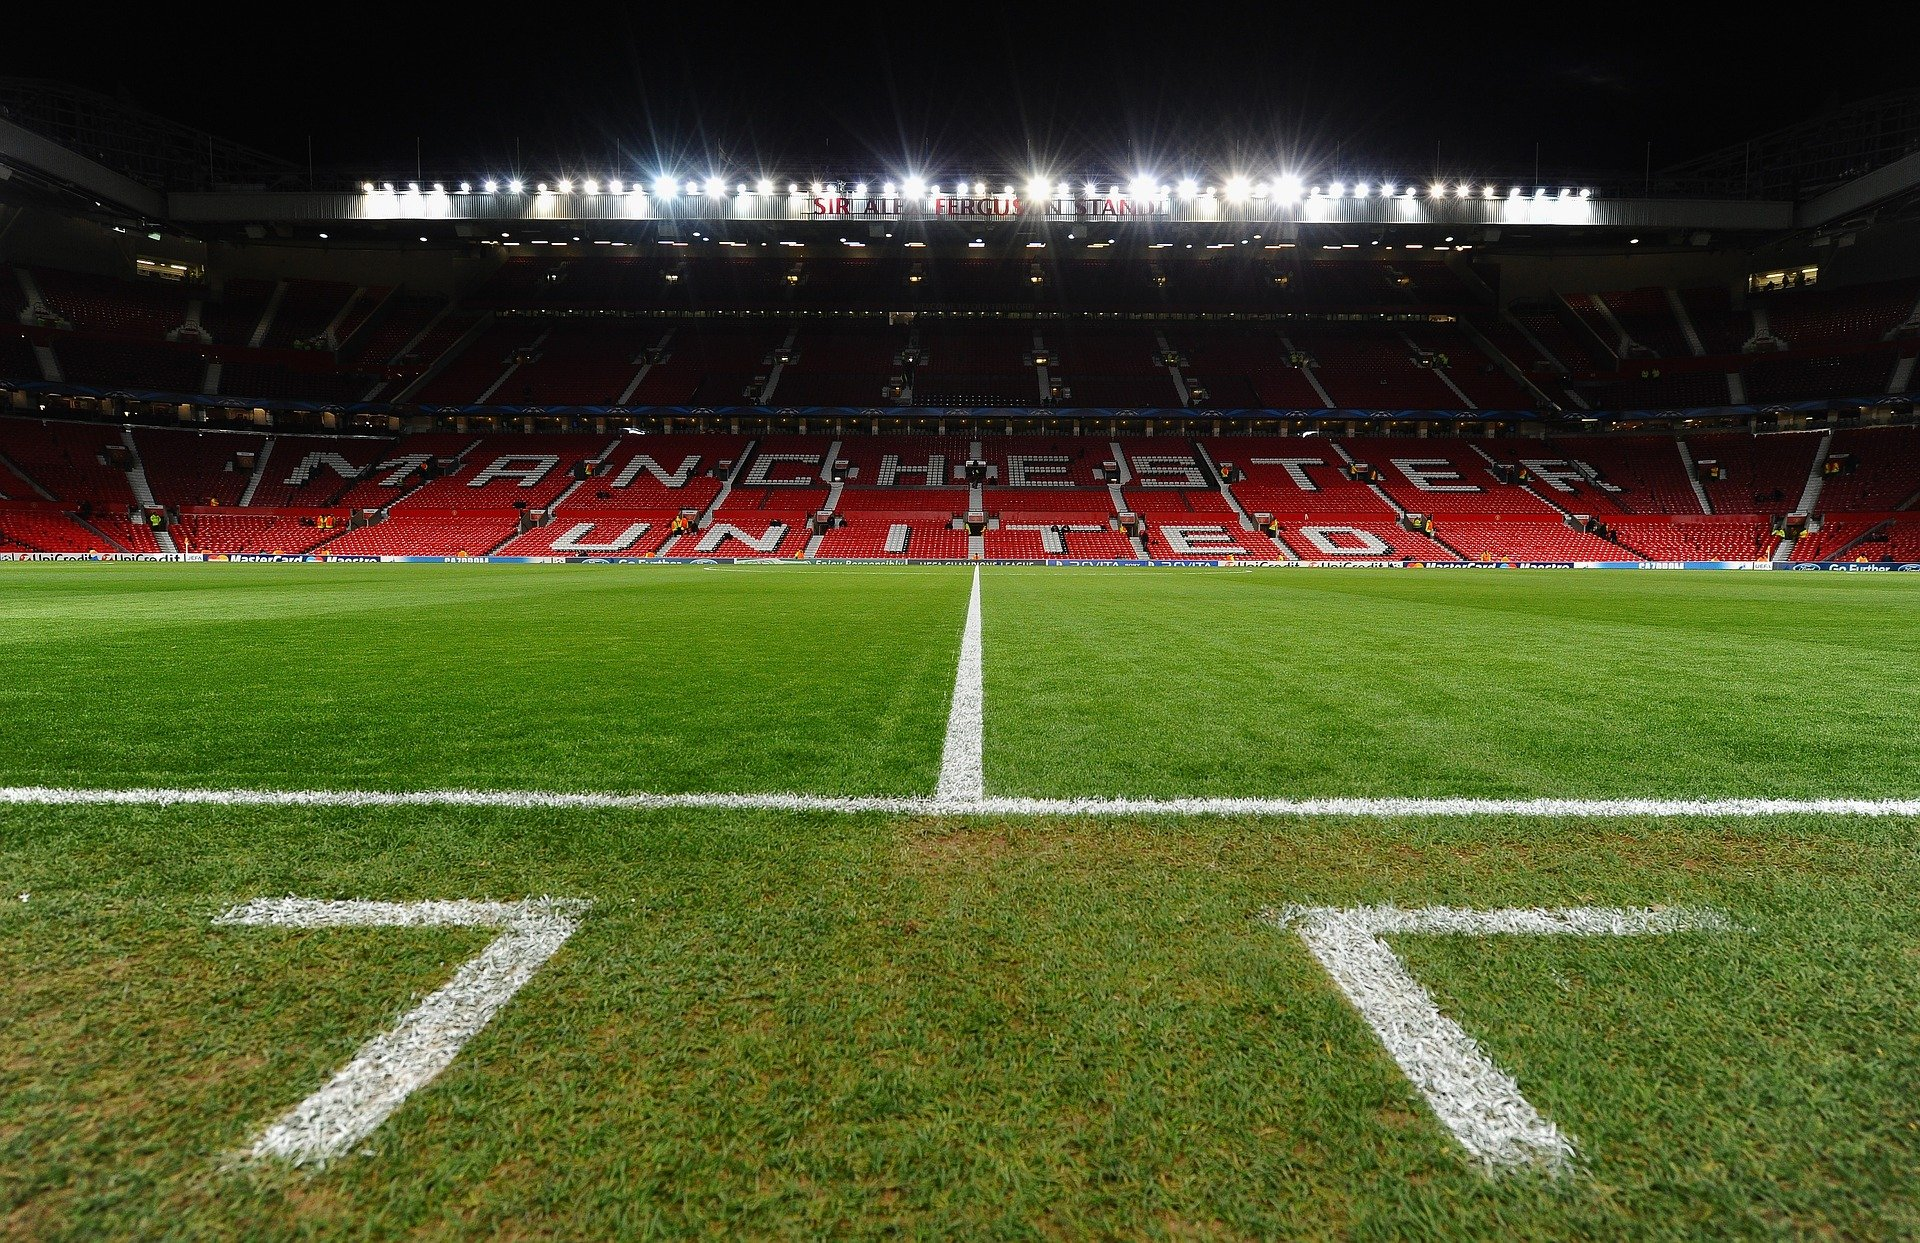 Fußball: Solskjaer feiert furiosen Auftakt bei Manchester United